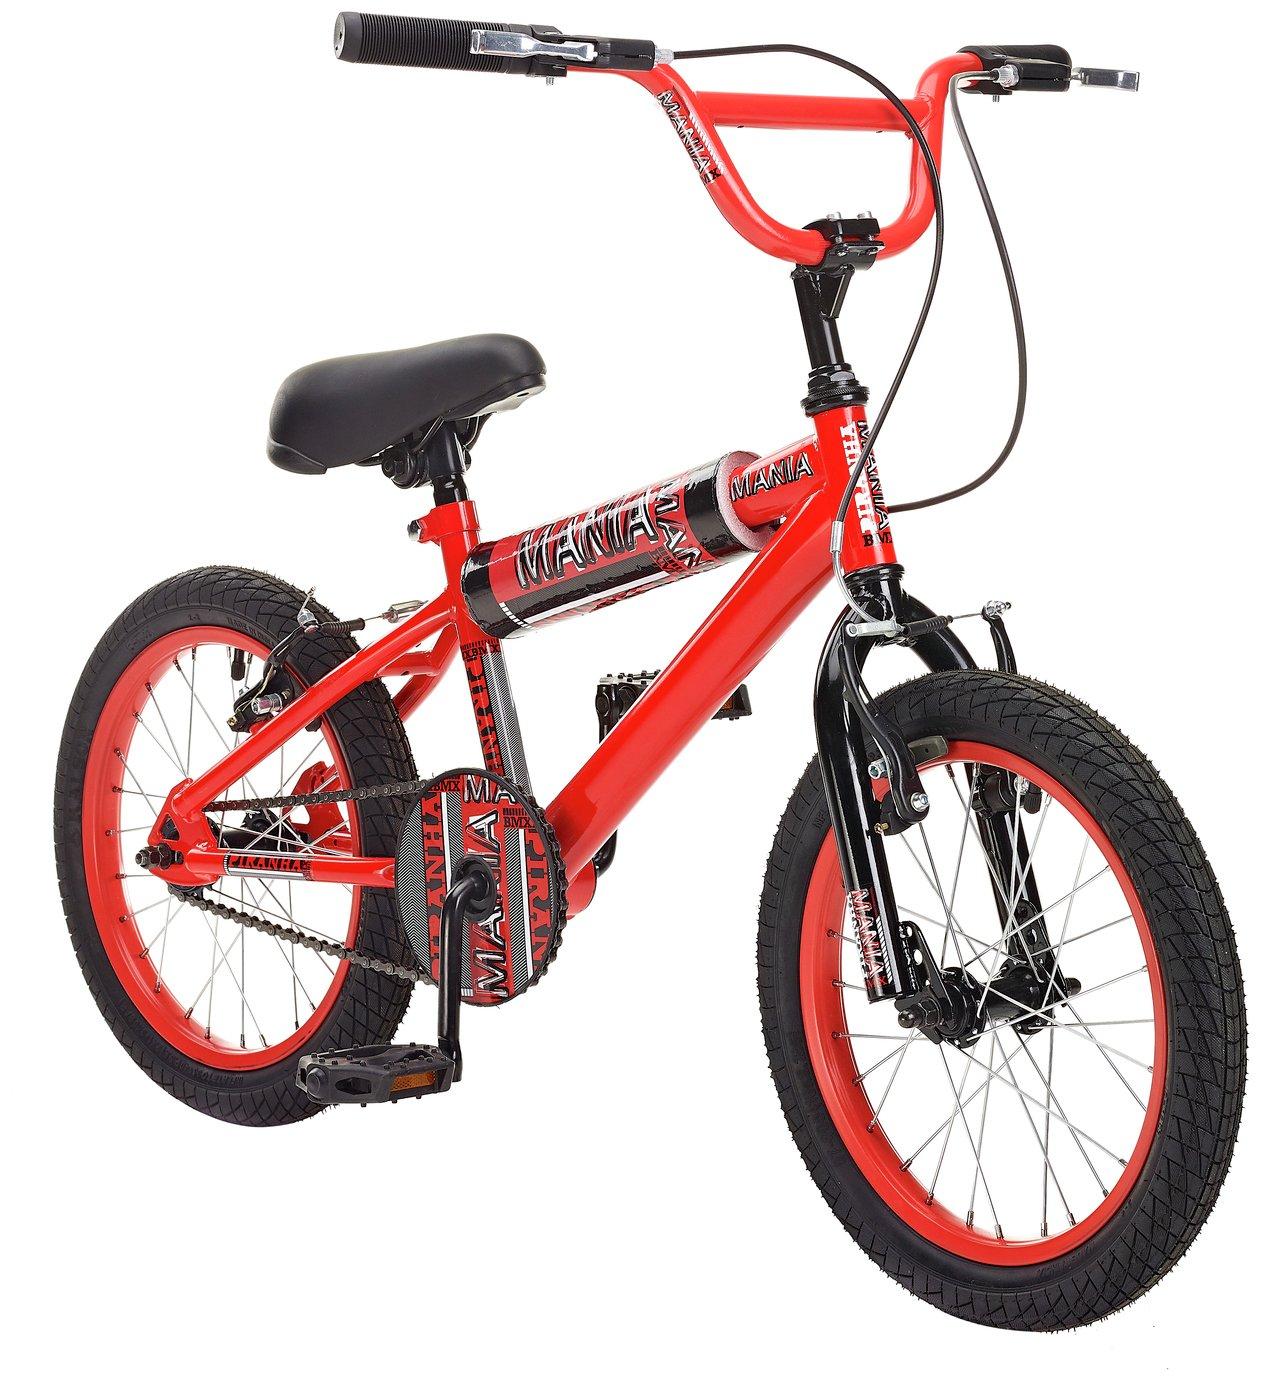 Piranha 16 Inch Mania BMX Bike